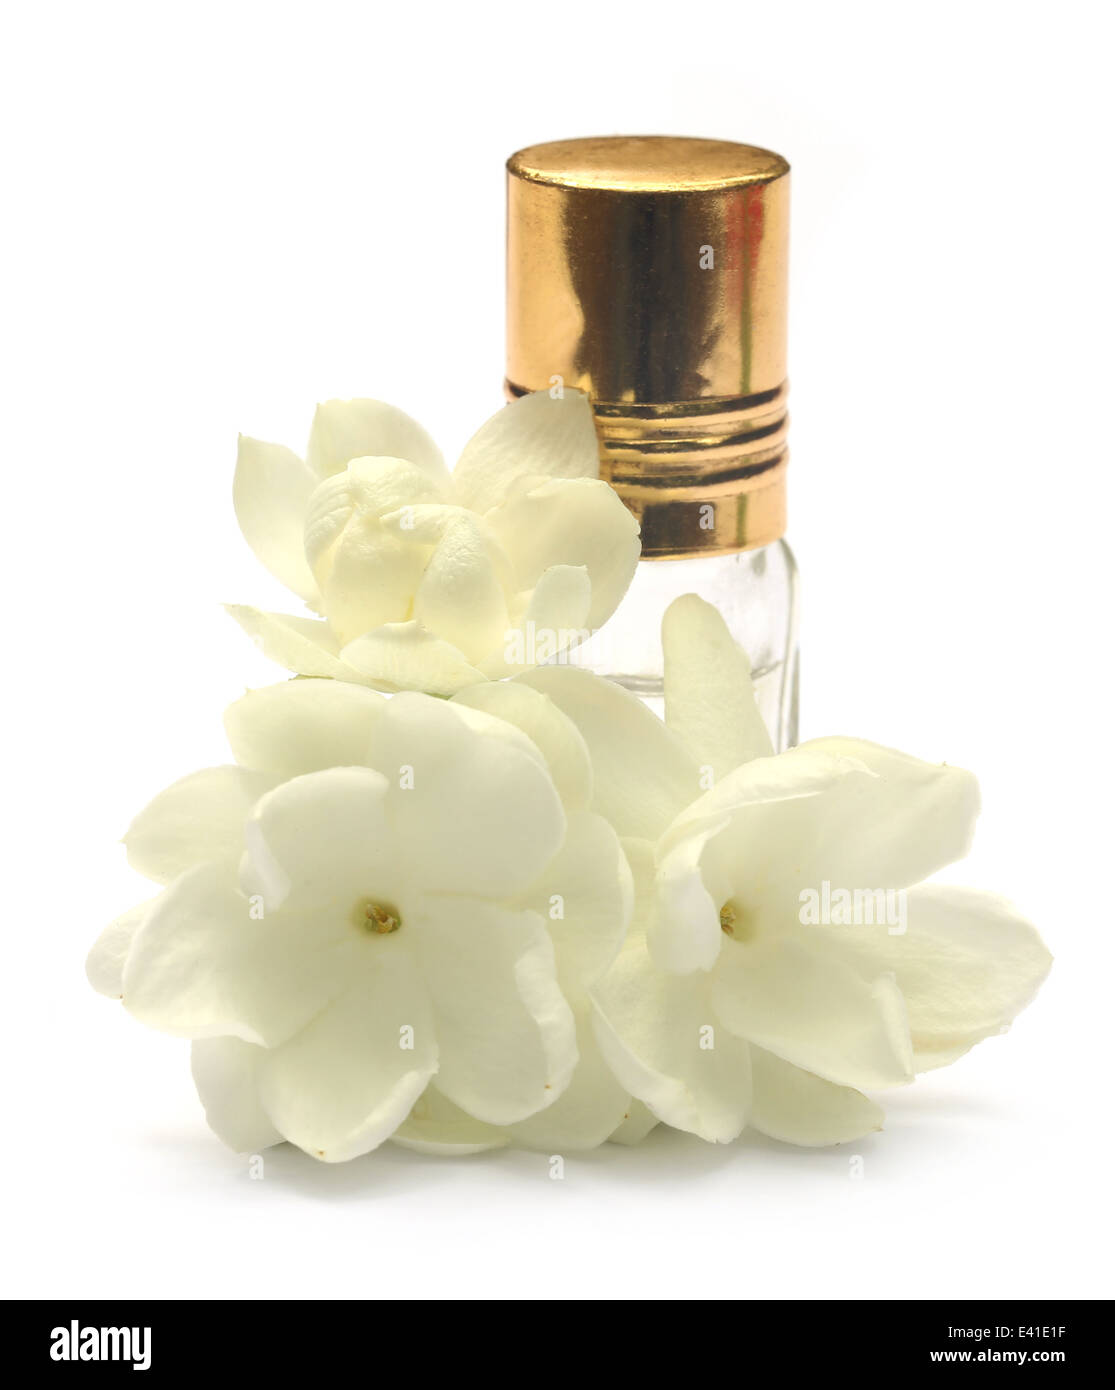 Perfume bottle jasmine flower stock photos perfume bottle jasmine jasmine flower with essence bottle over white background stock image izmirmasajfo